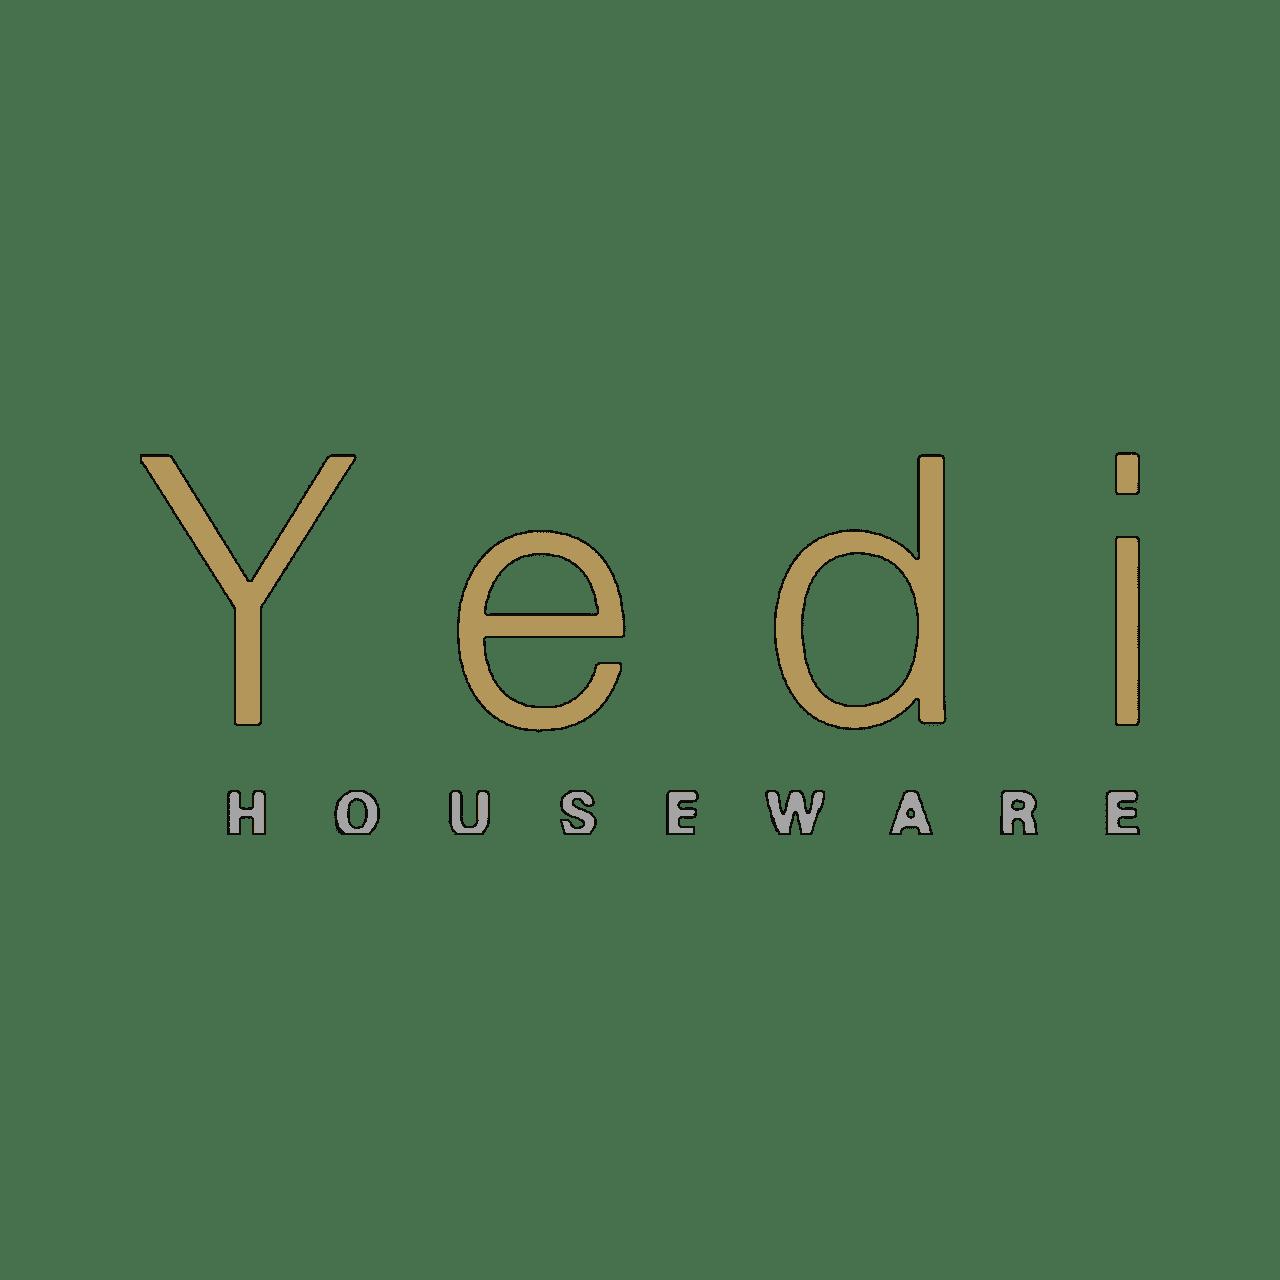 Yedi Houseware